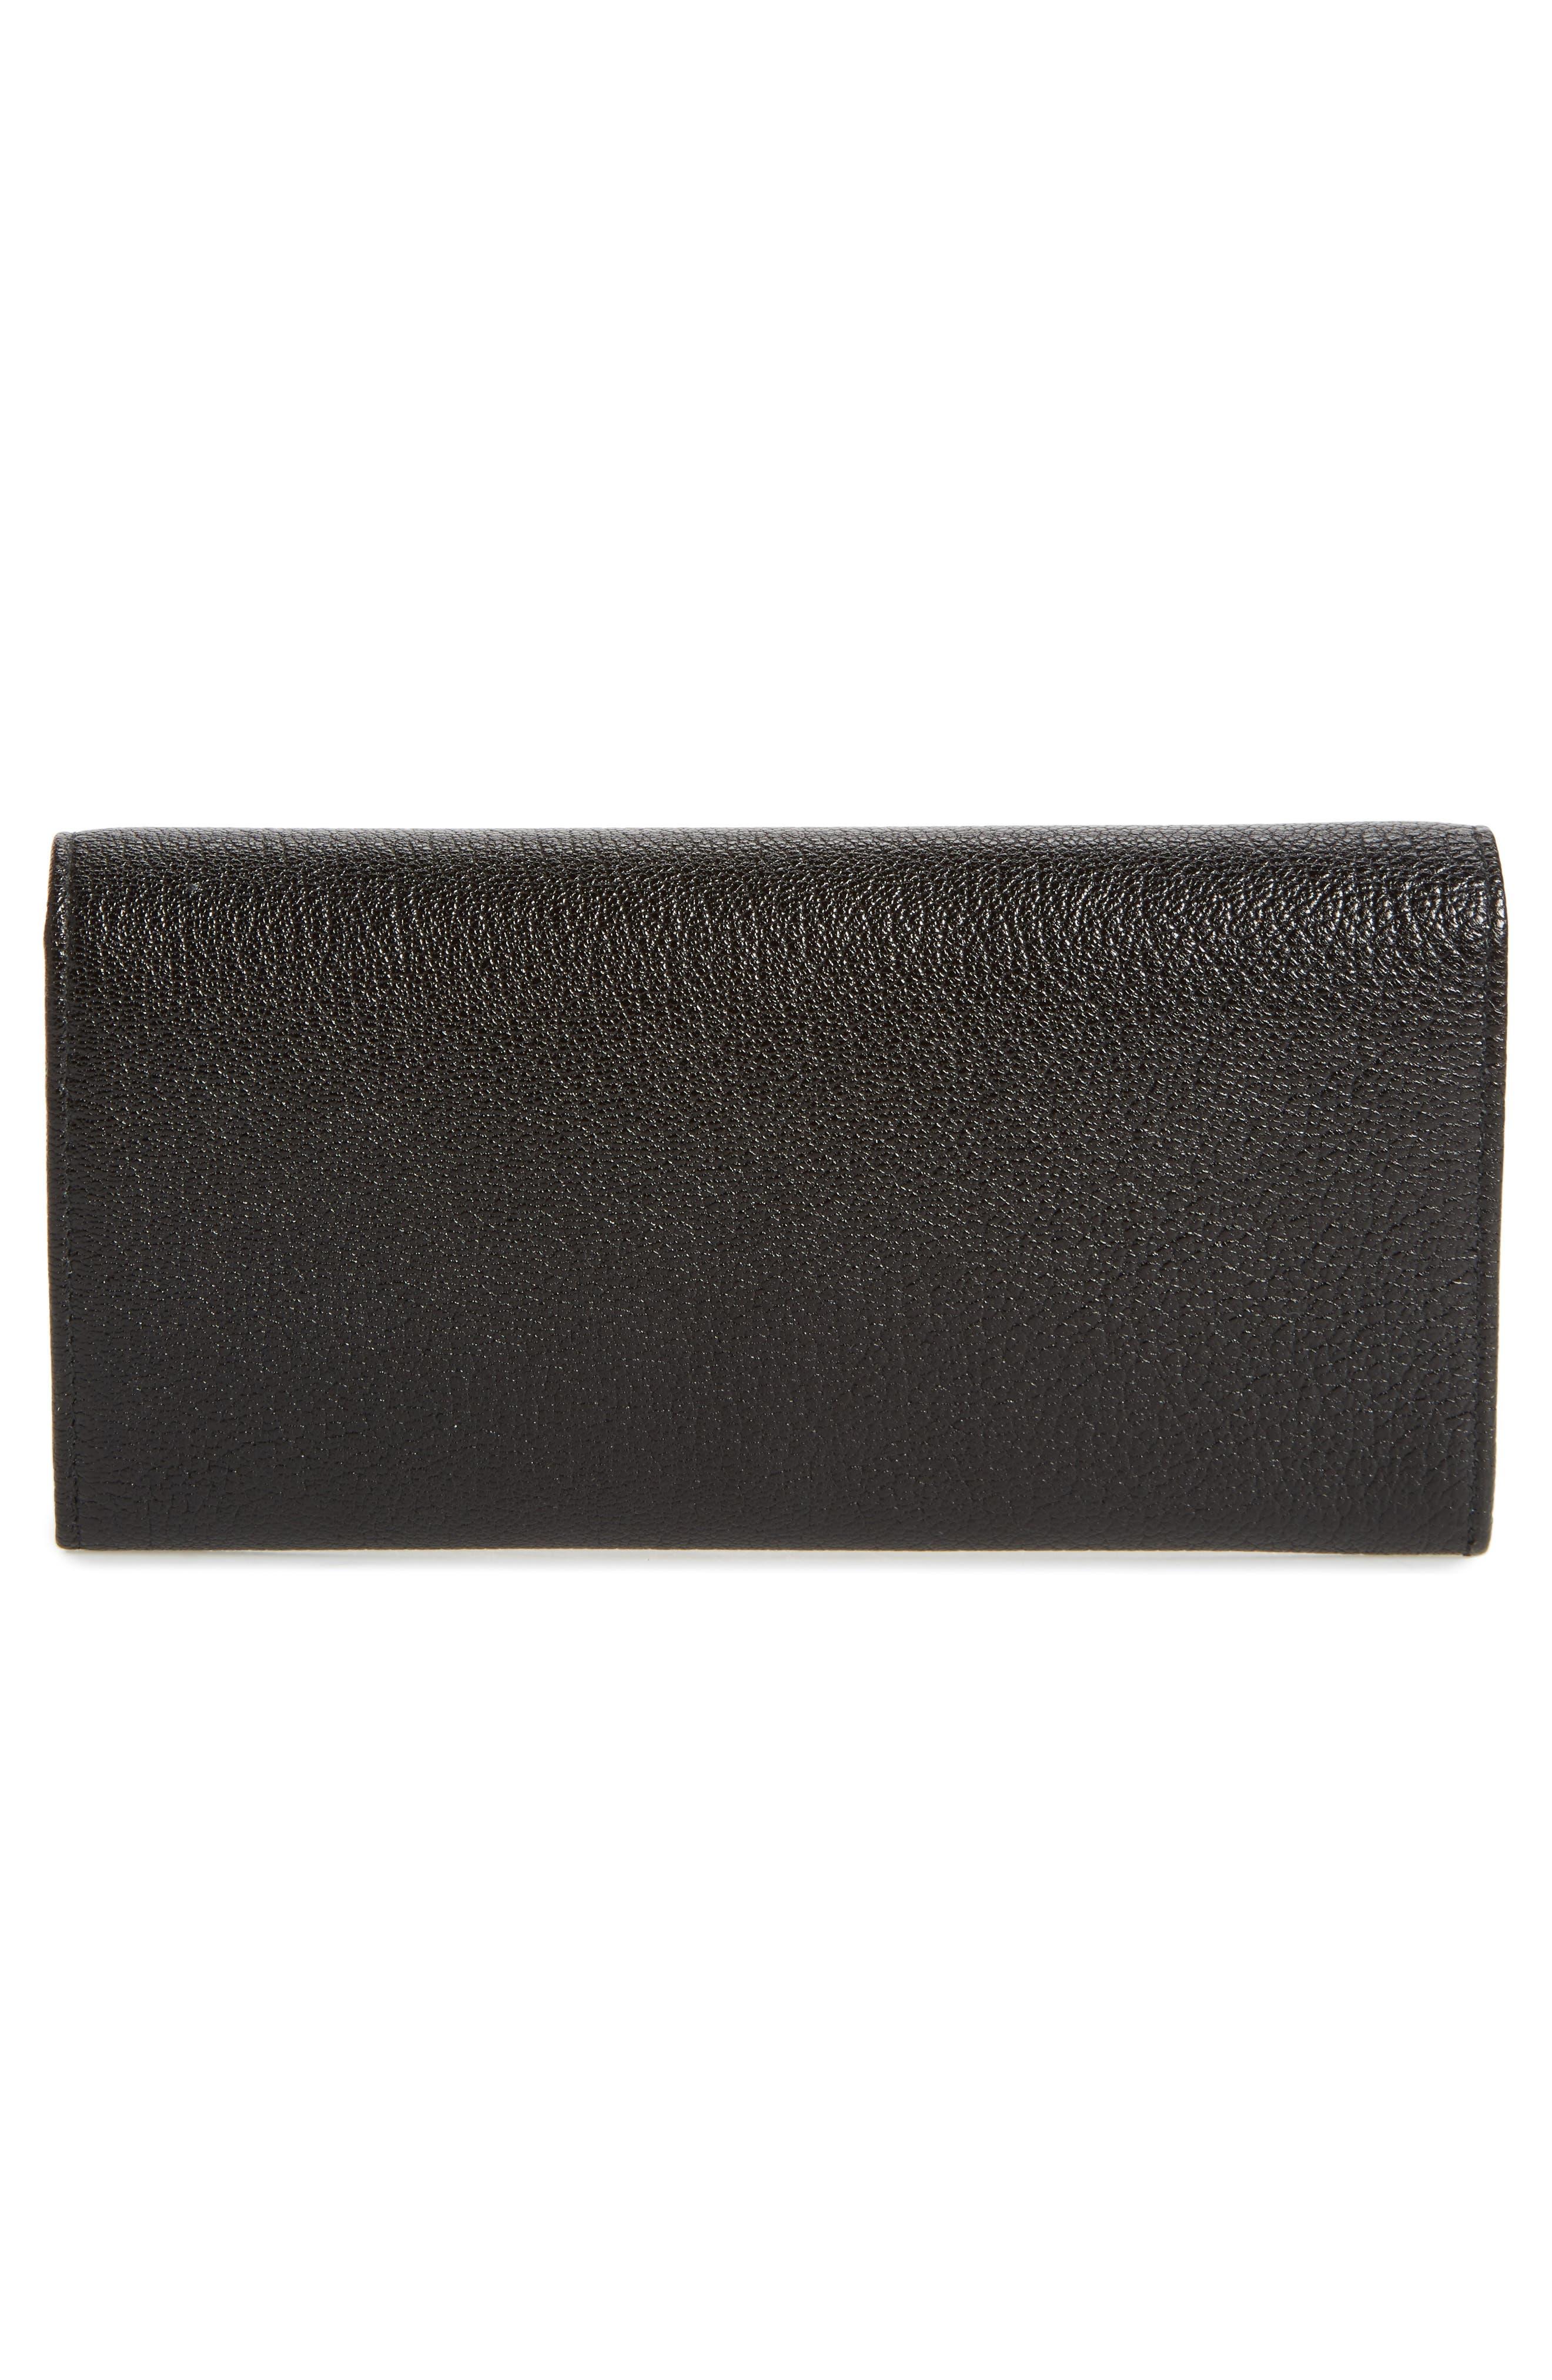 Metallic Edge Leather Wallet,                             Alternate thumbnail 3, color,                             NOIR